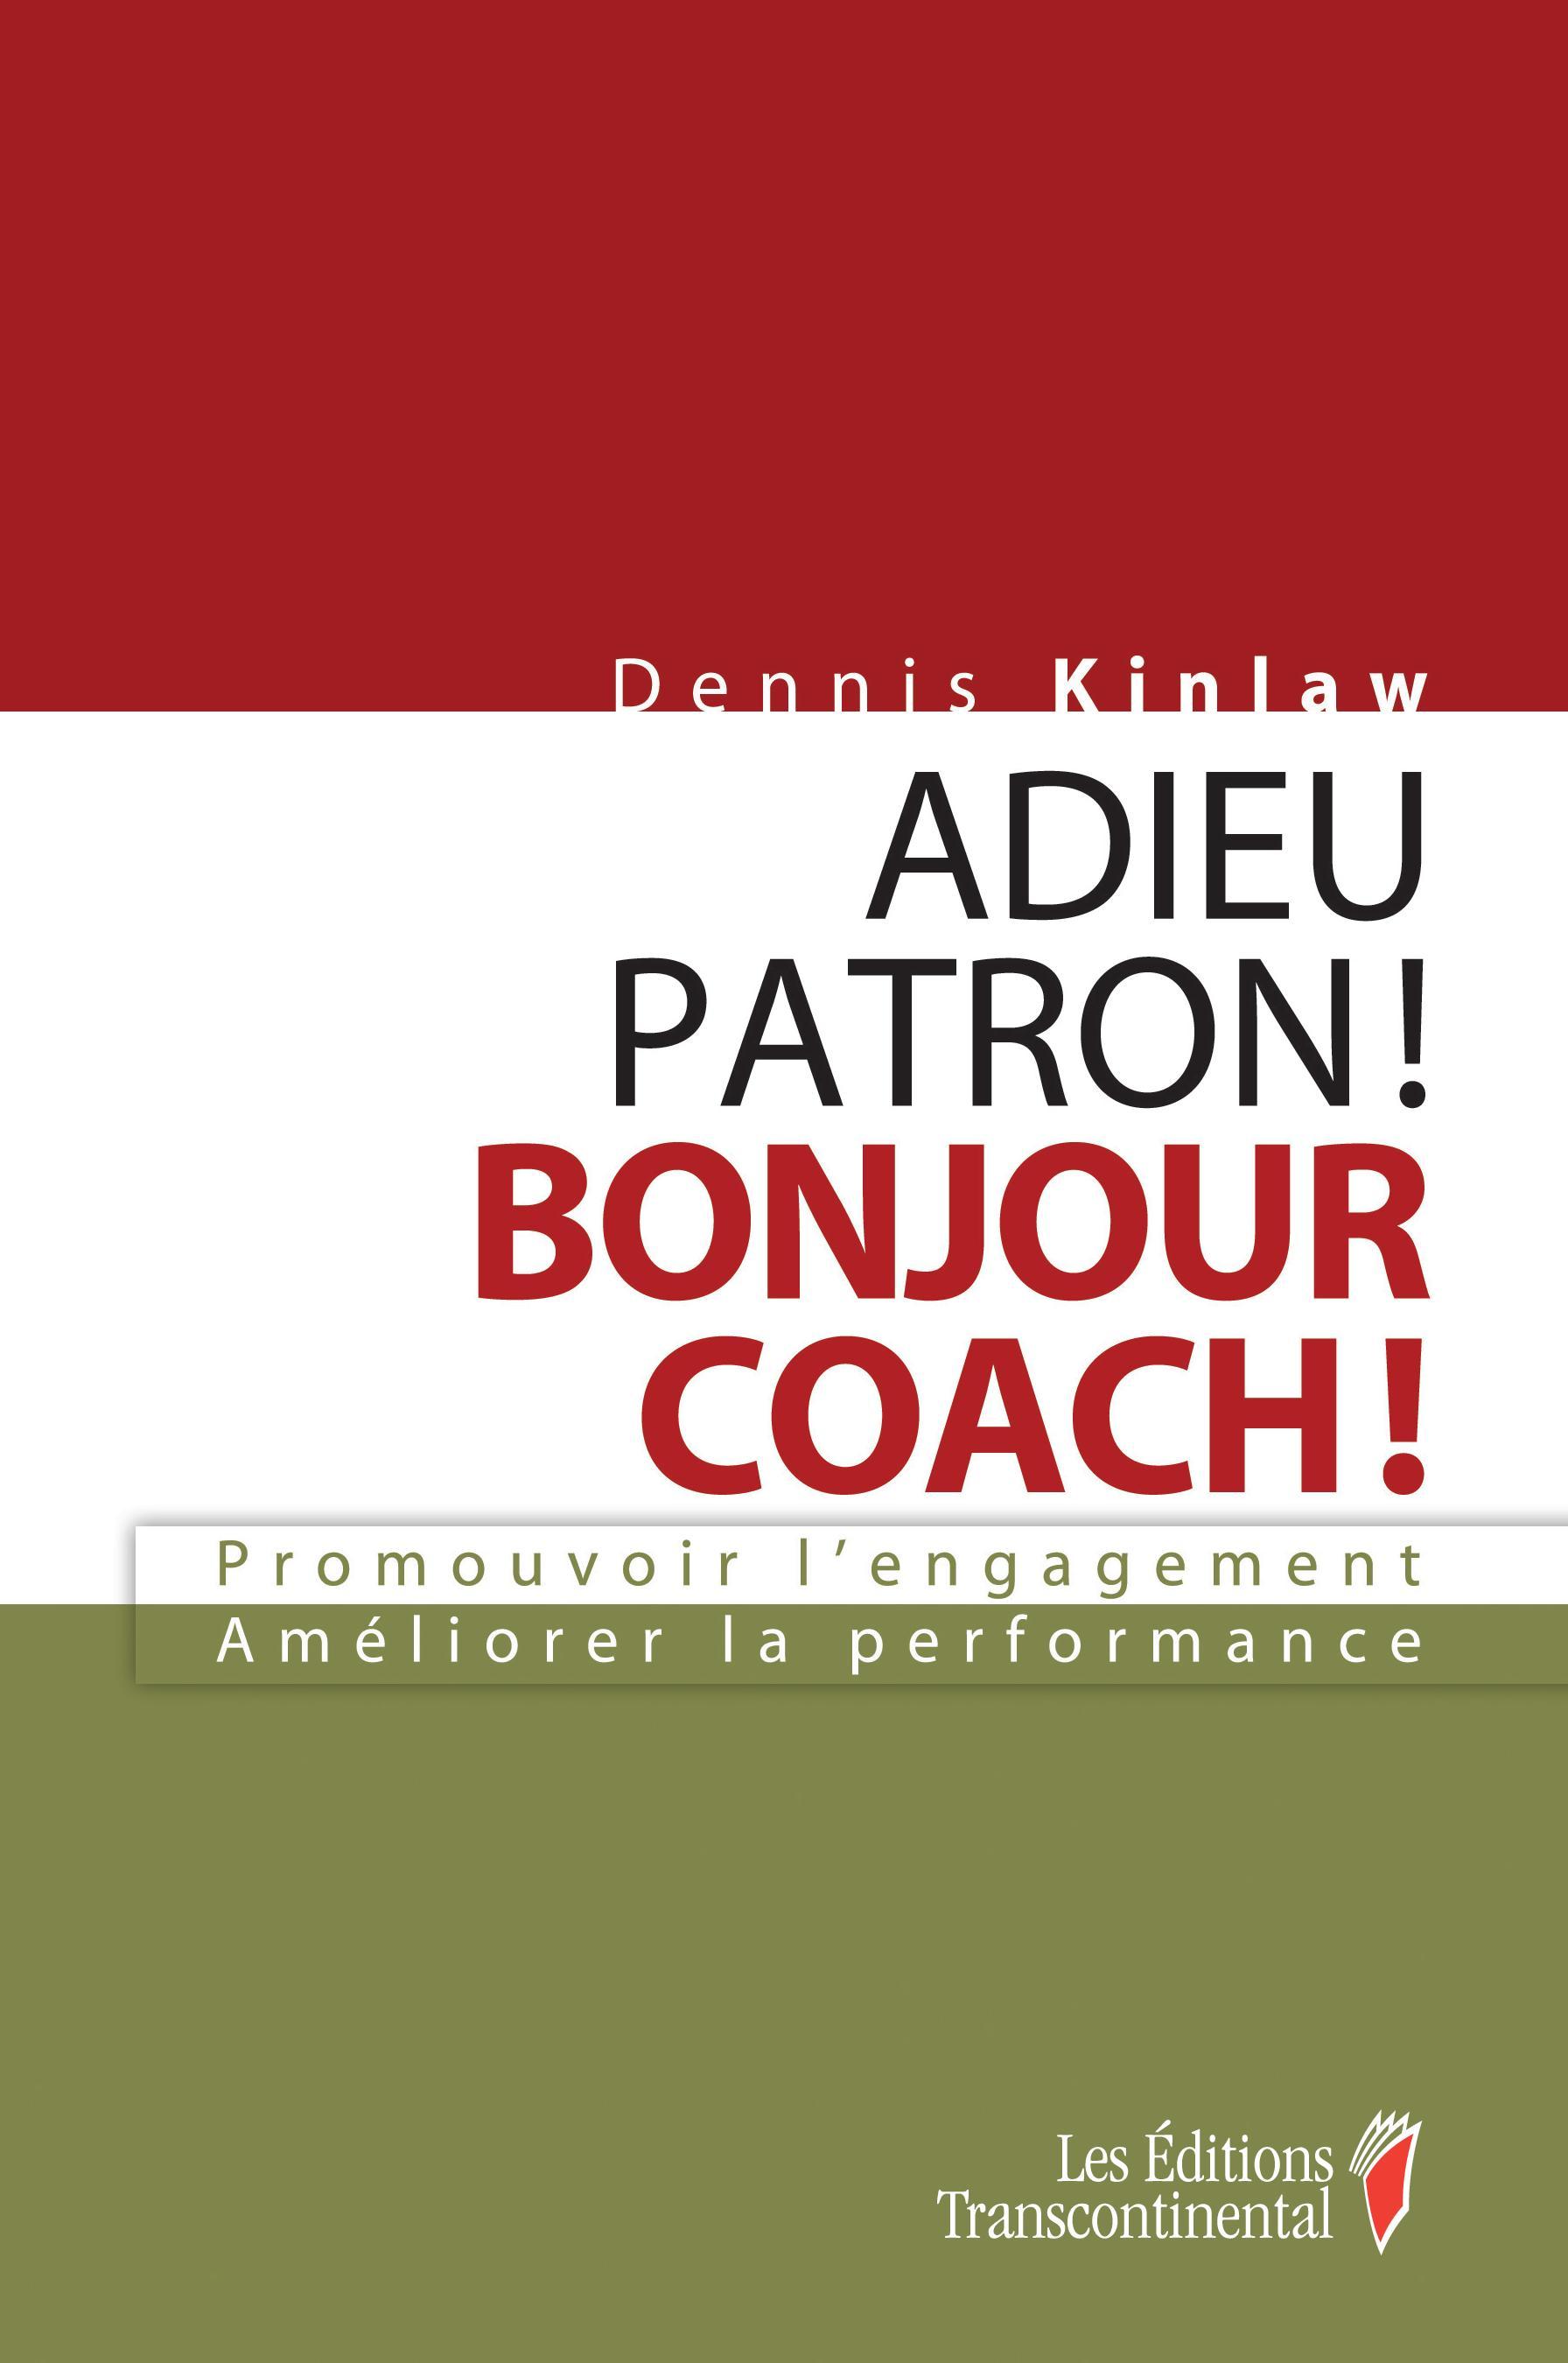 Adieu patron! Bonjour coach!